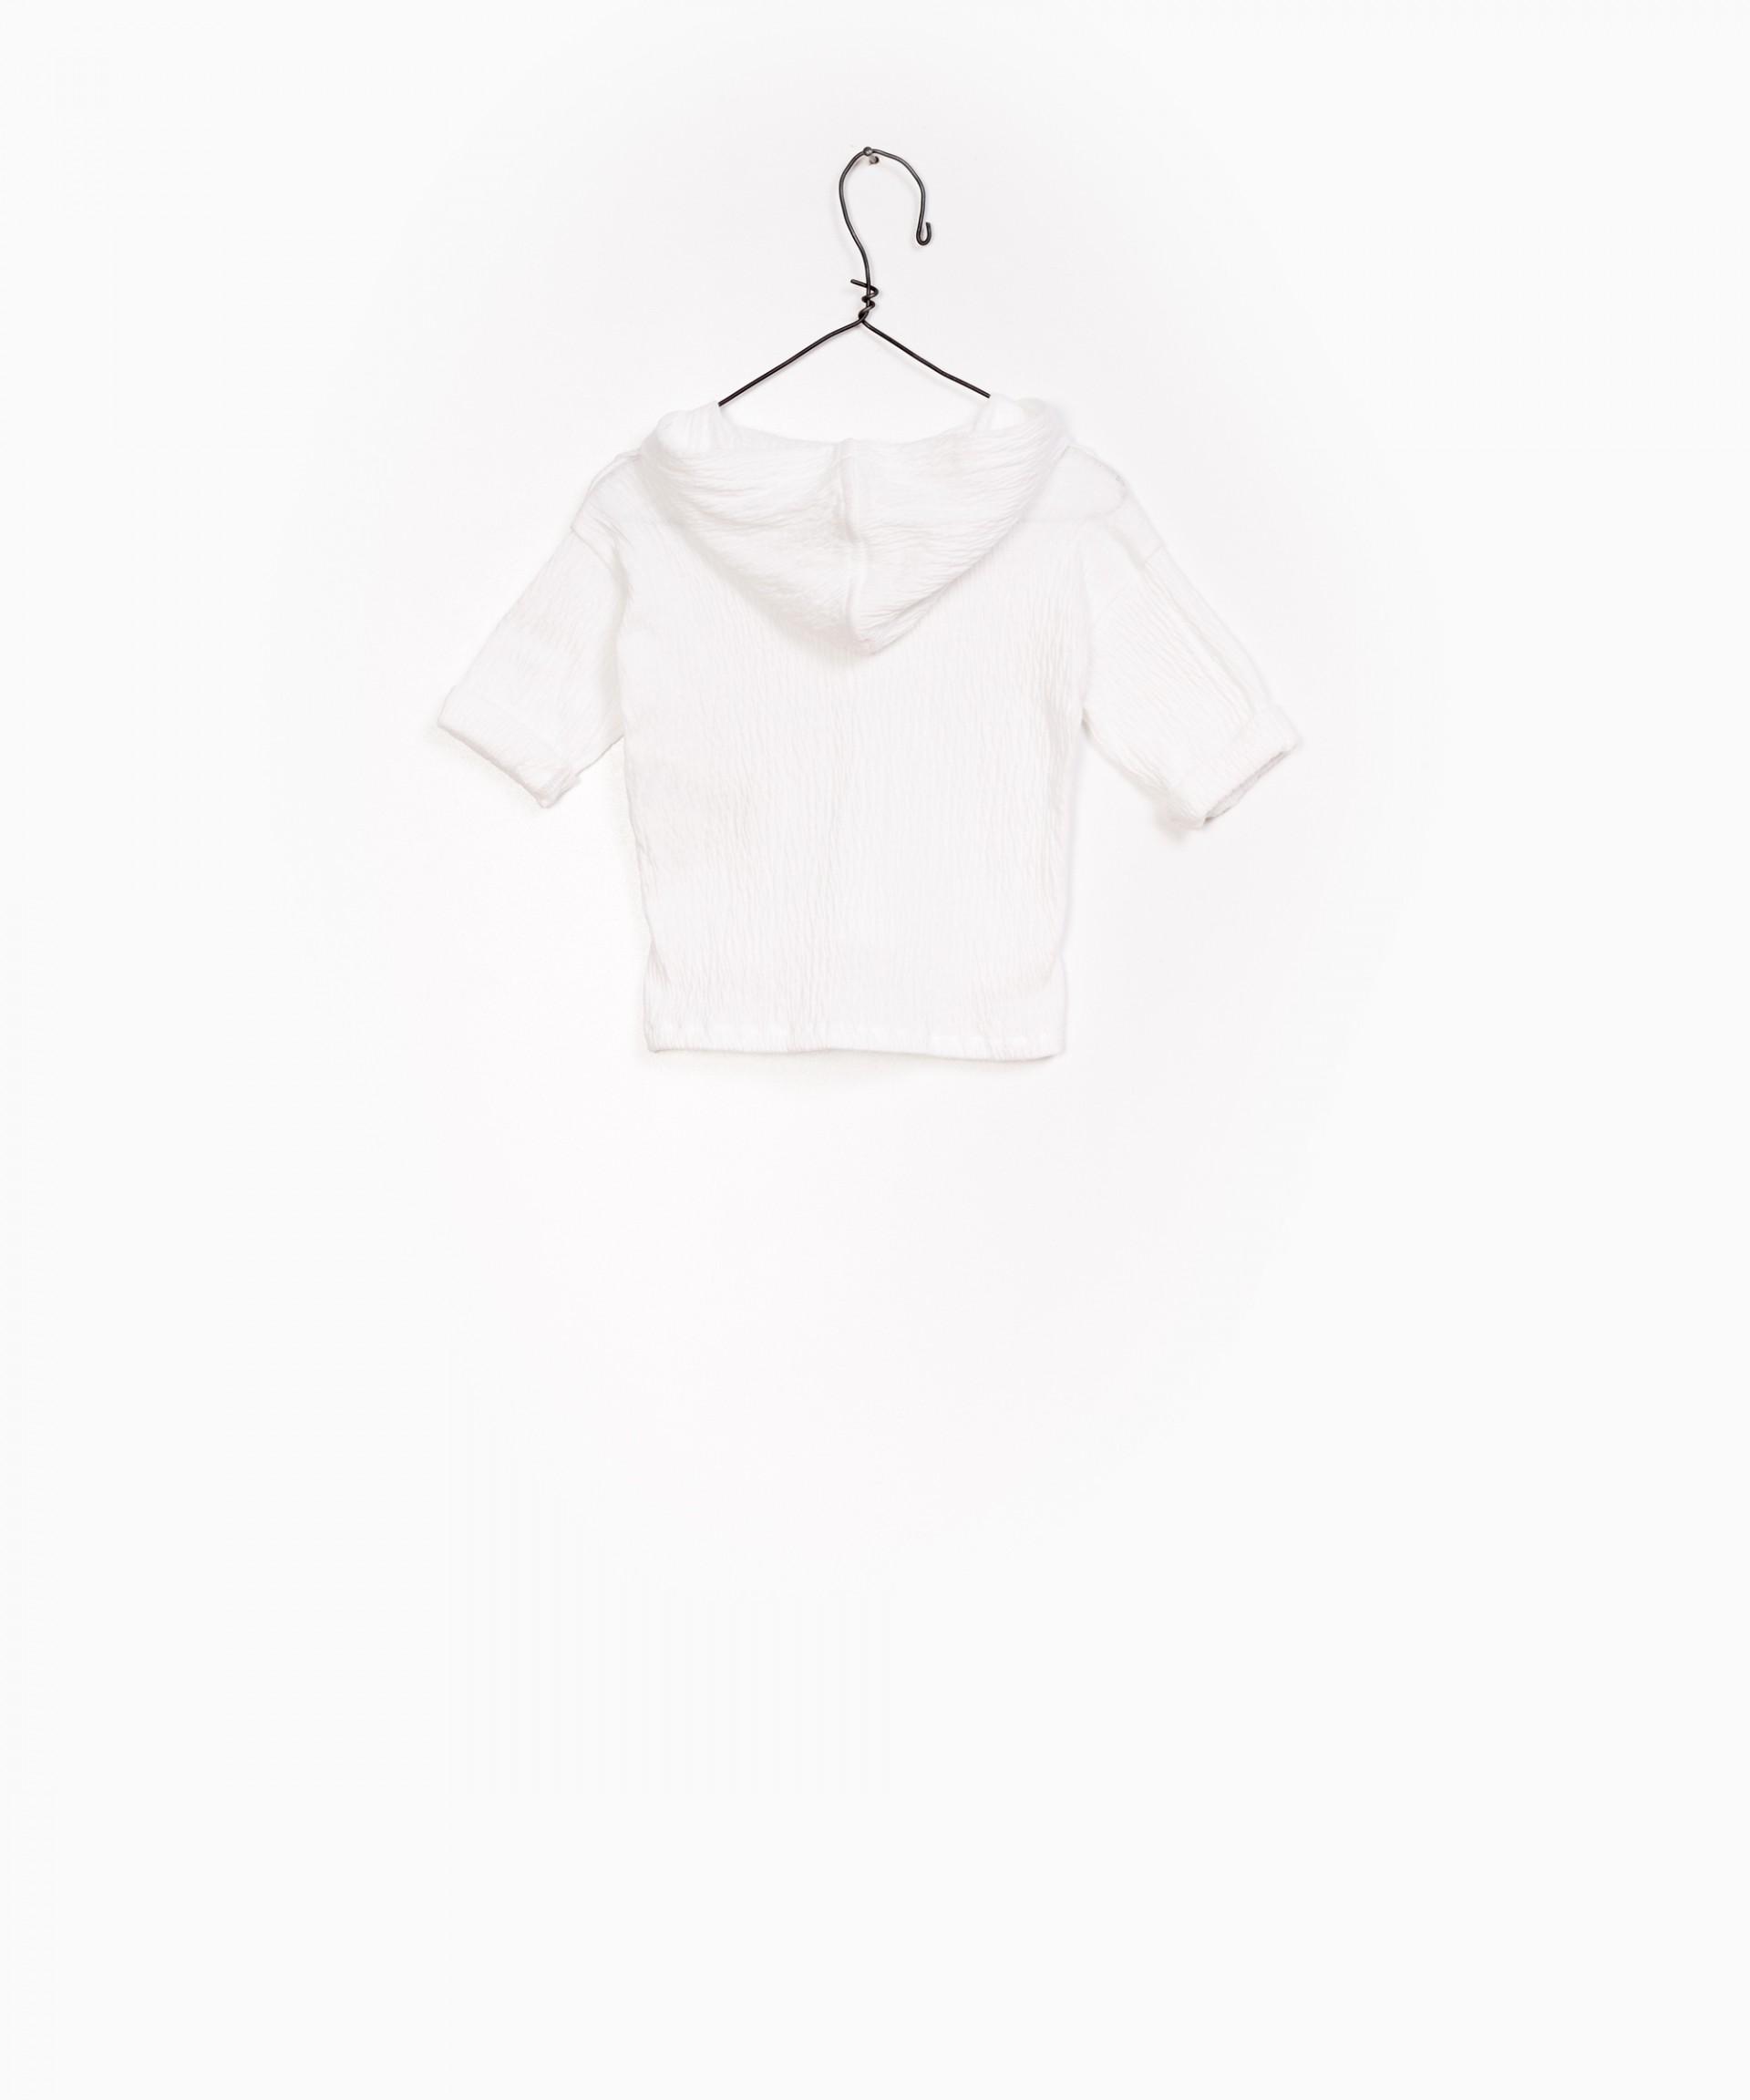 Camisa Jersey com capuz